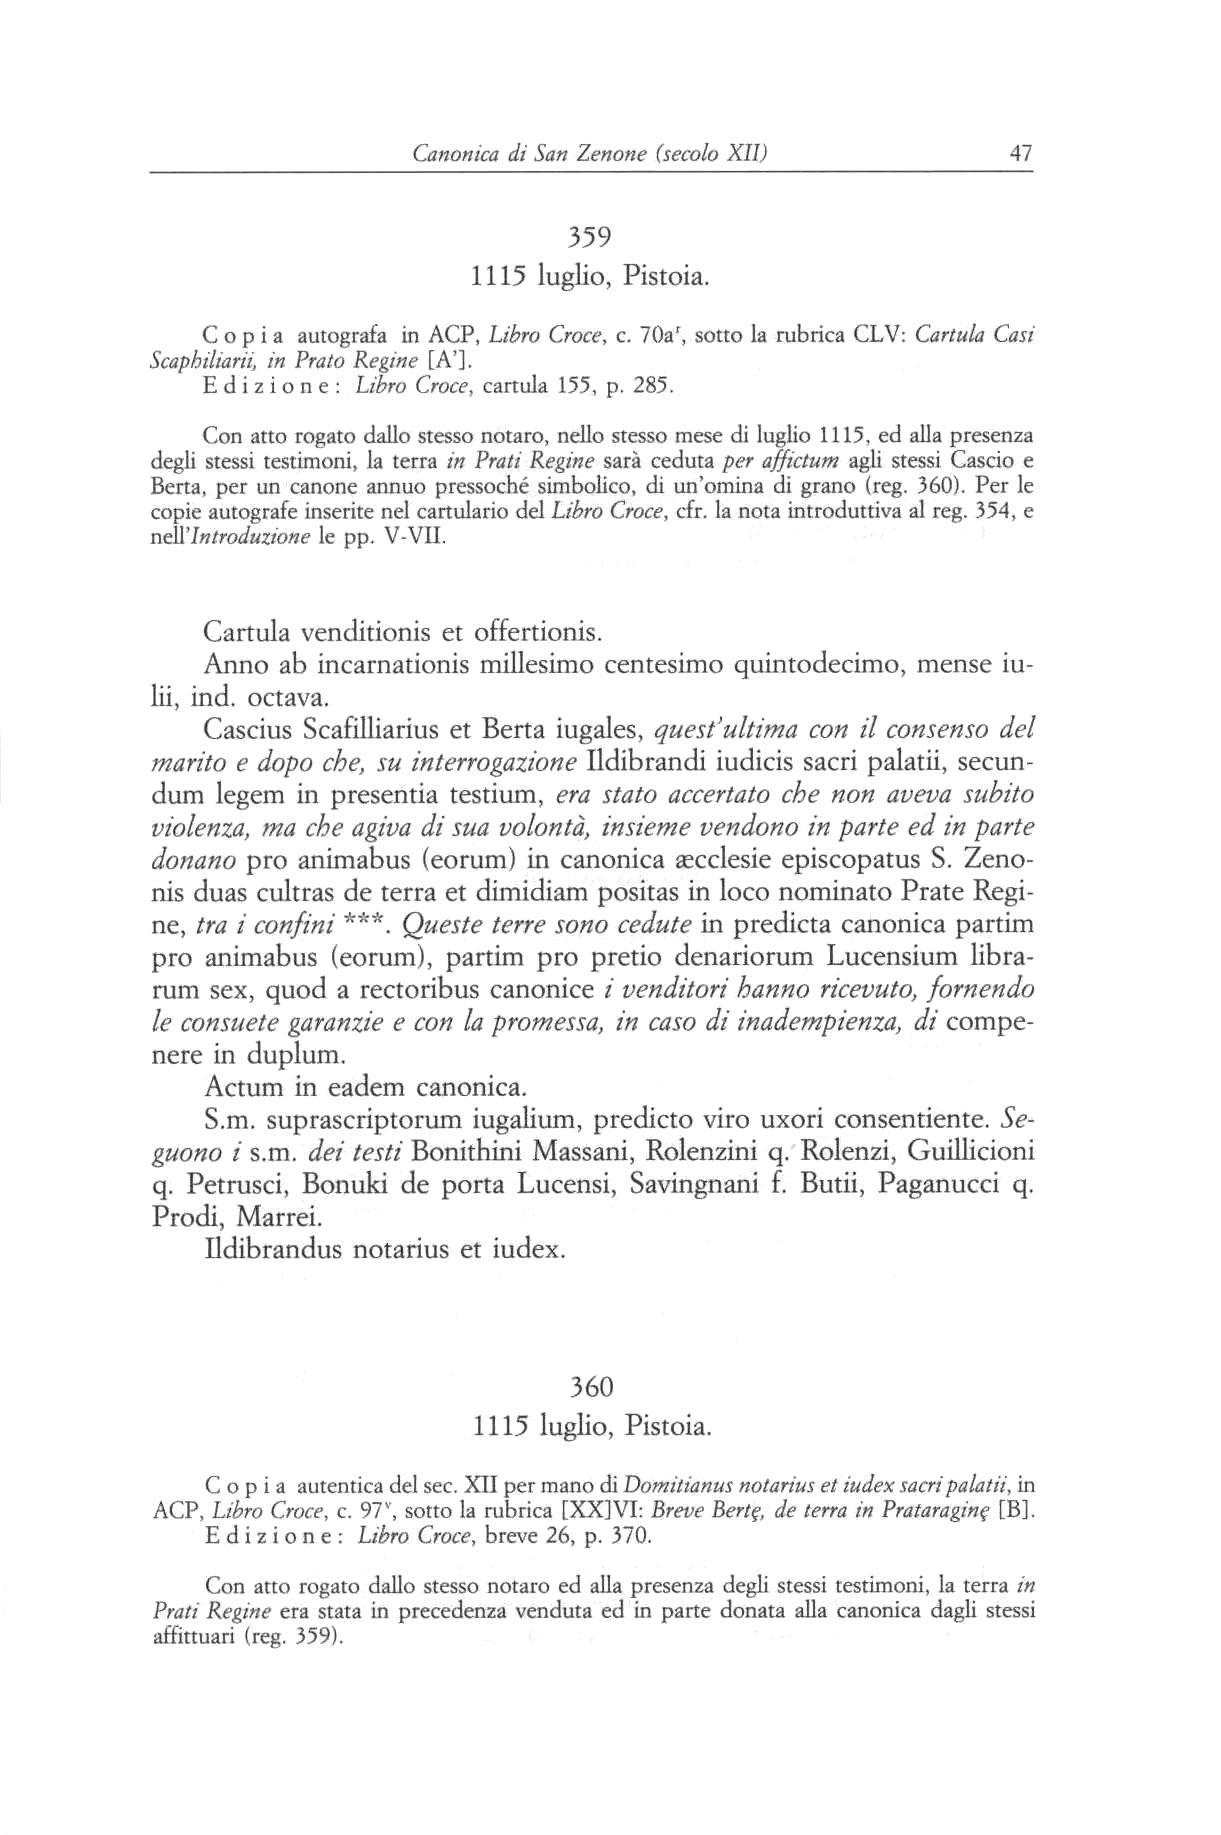 Canonica S. Zenone XII 0047.jpg